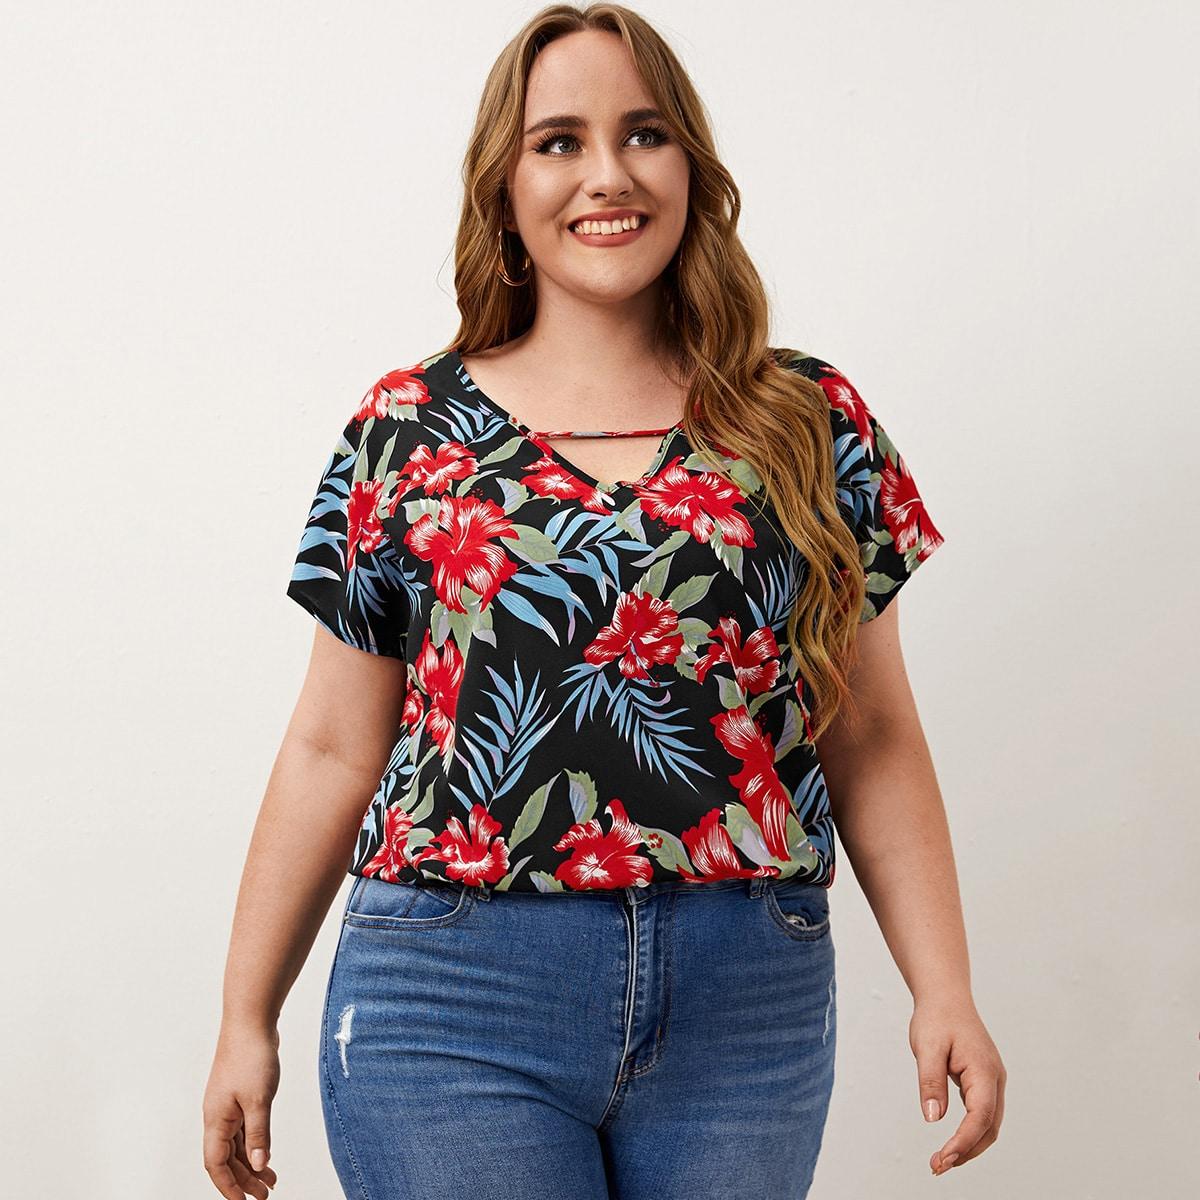 SHEIN Boho Tropisch Grote maat blouse